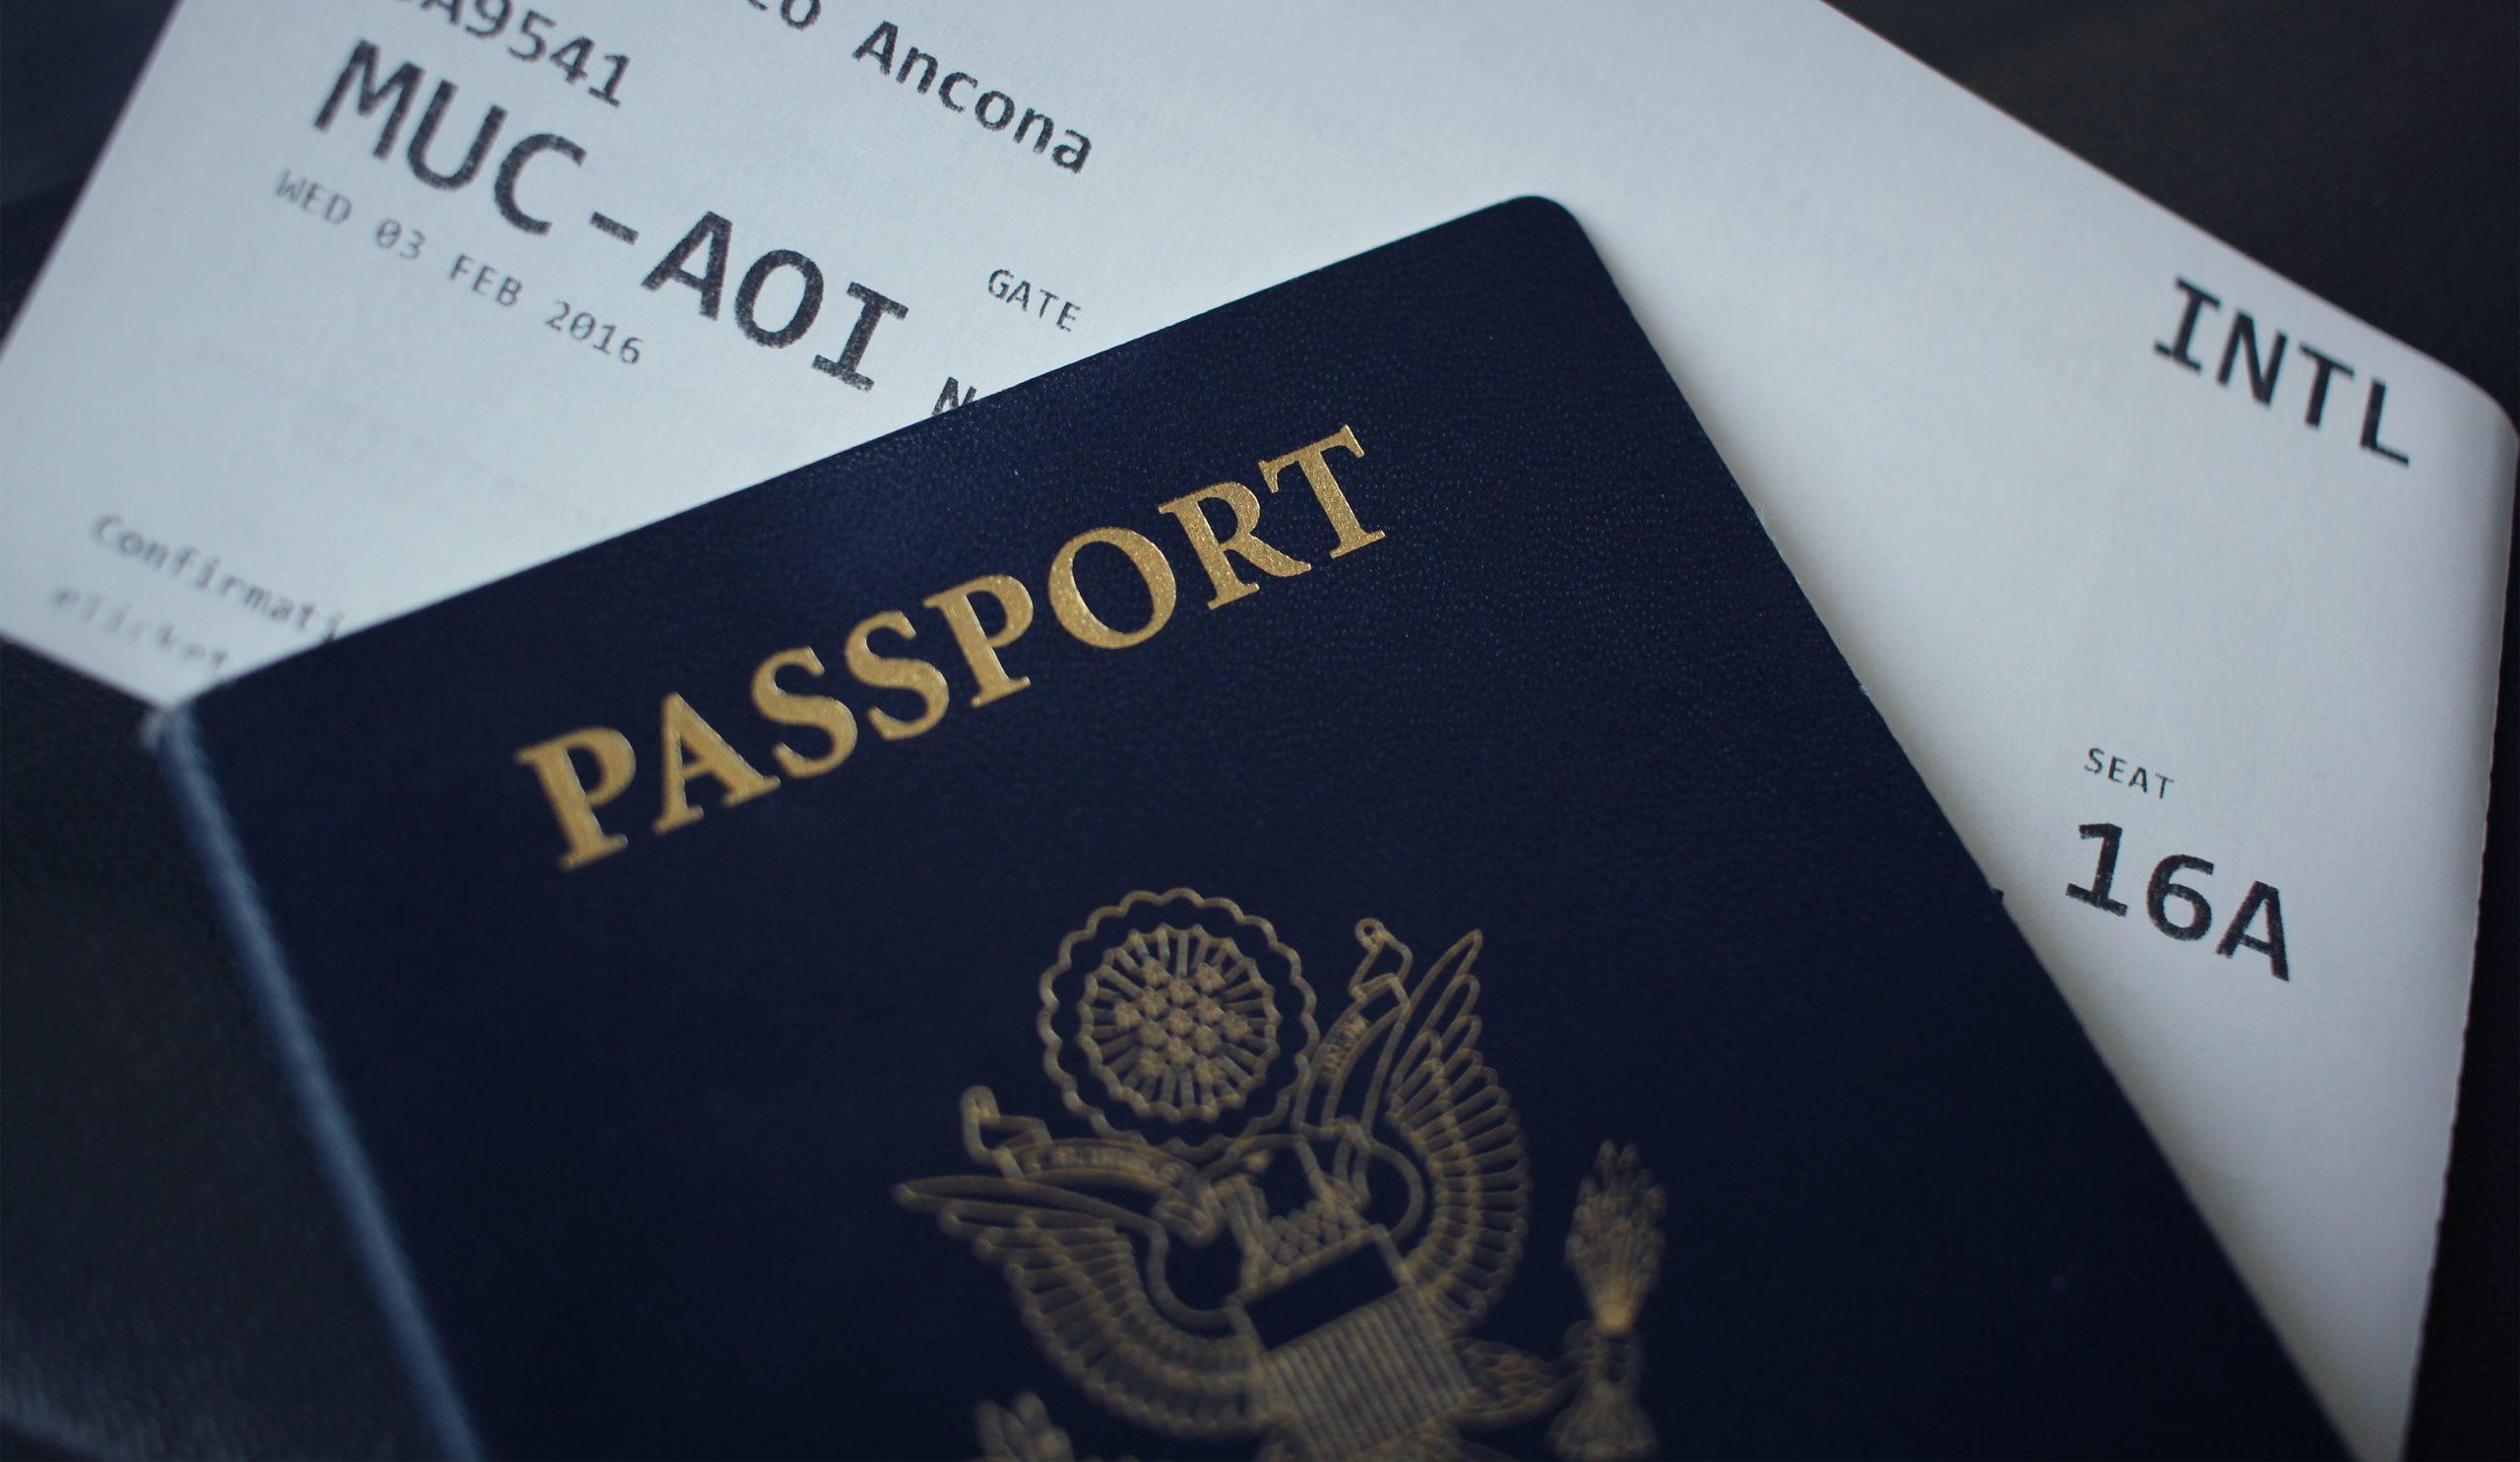 Enjoy living in Thailand for 10 years visa worry free #elite living #Thailand #Bangkok #Luxury